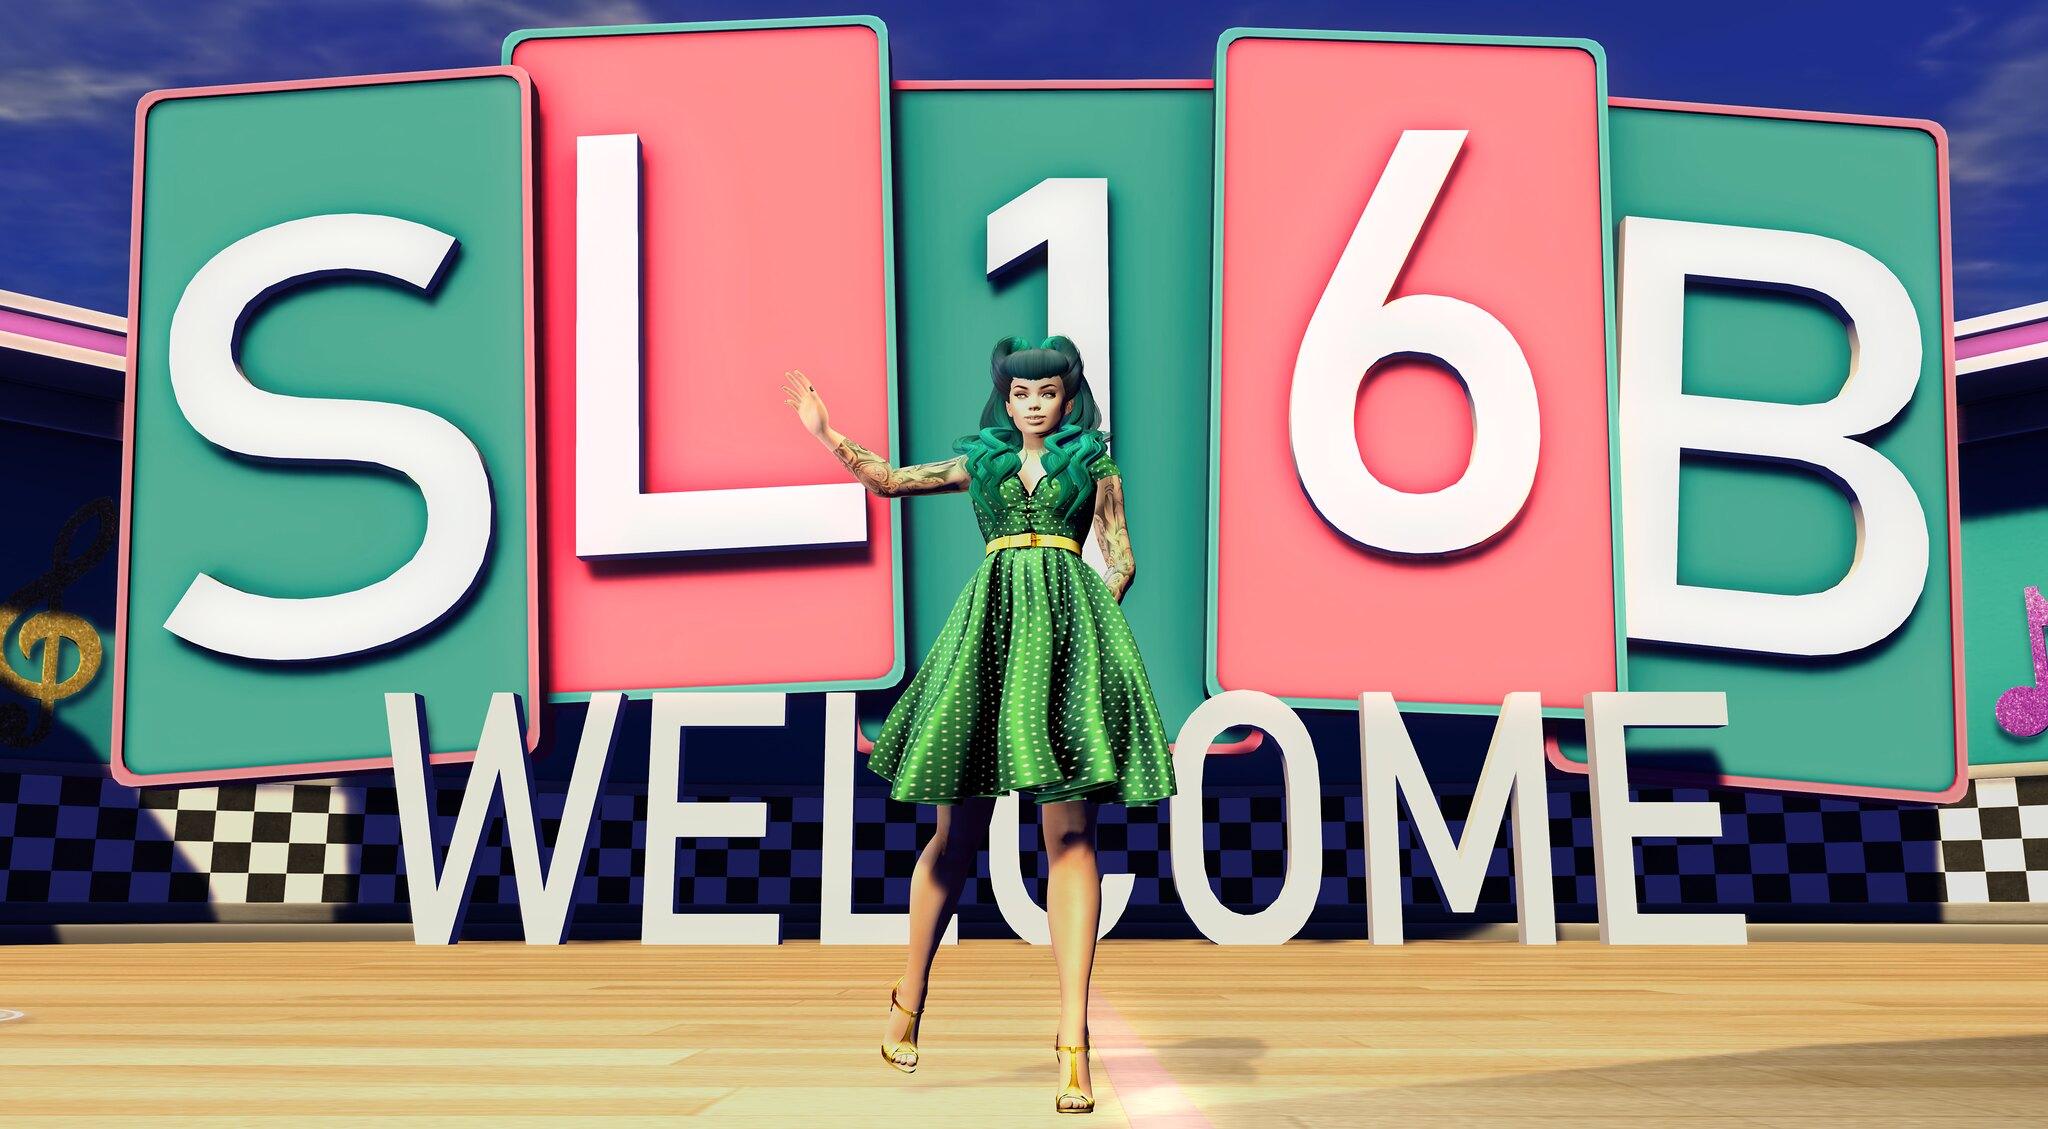 SL16B Welcome Area